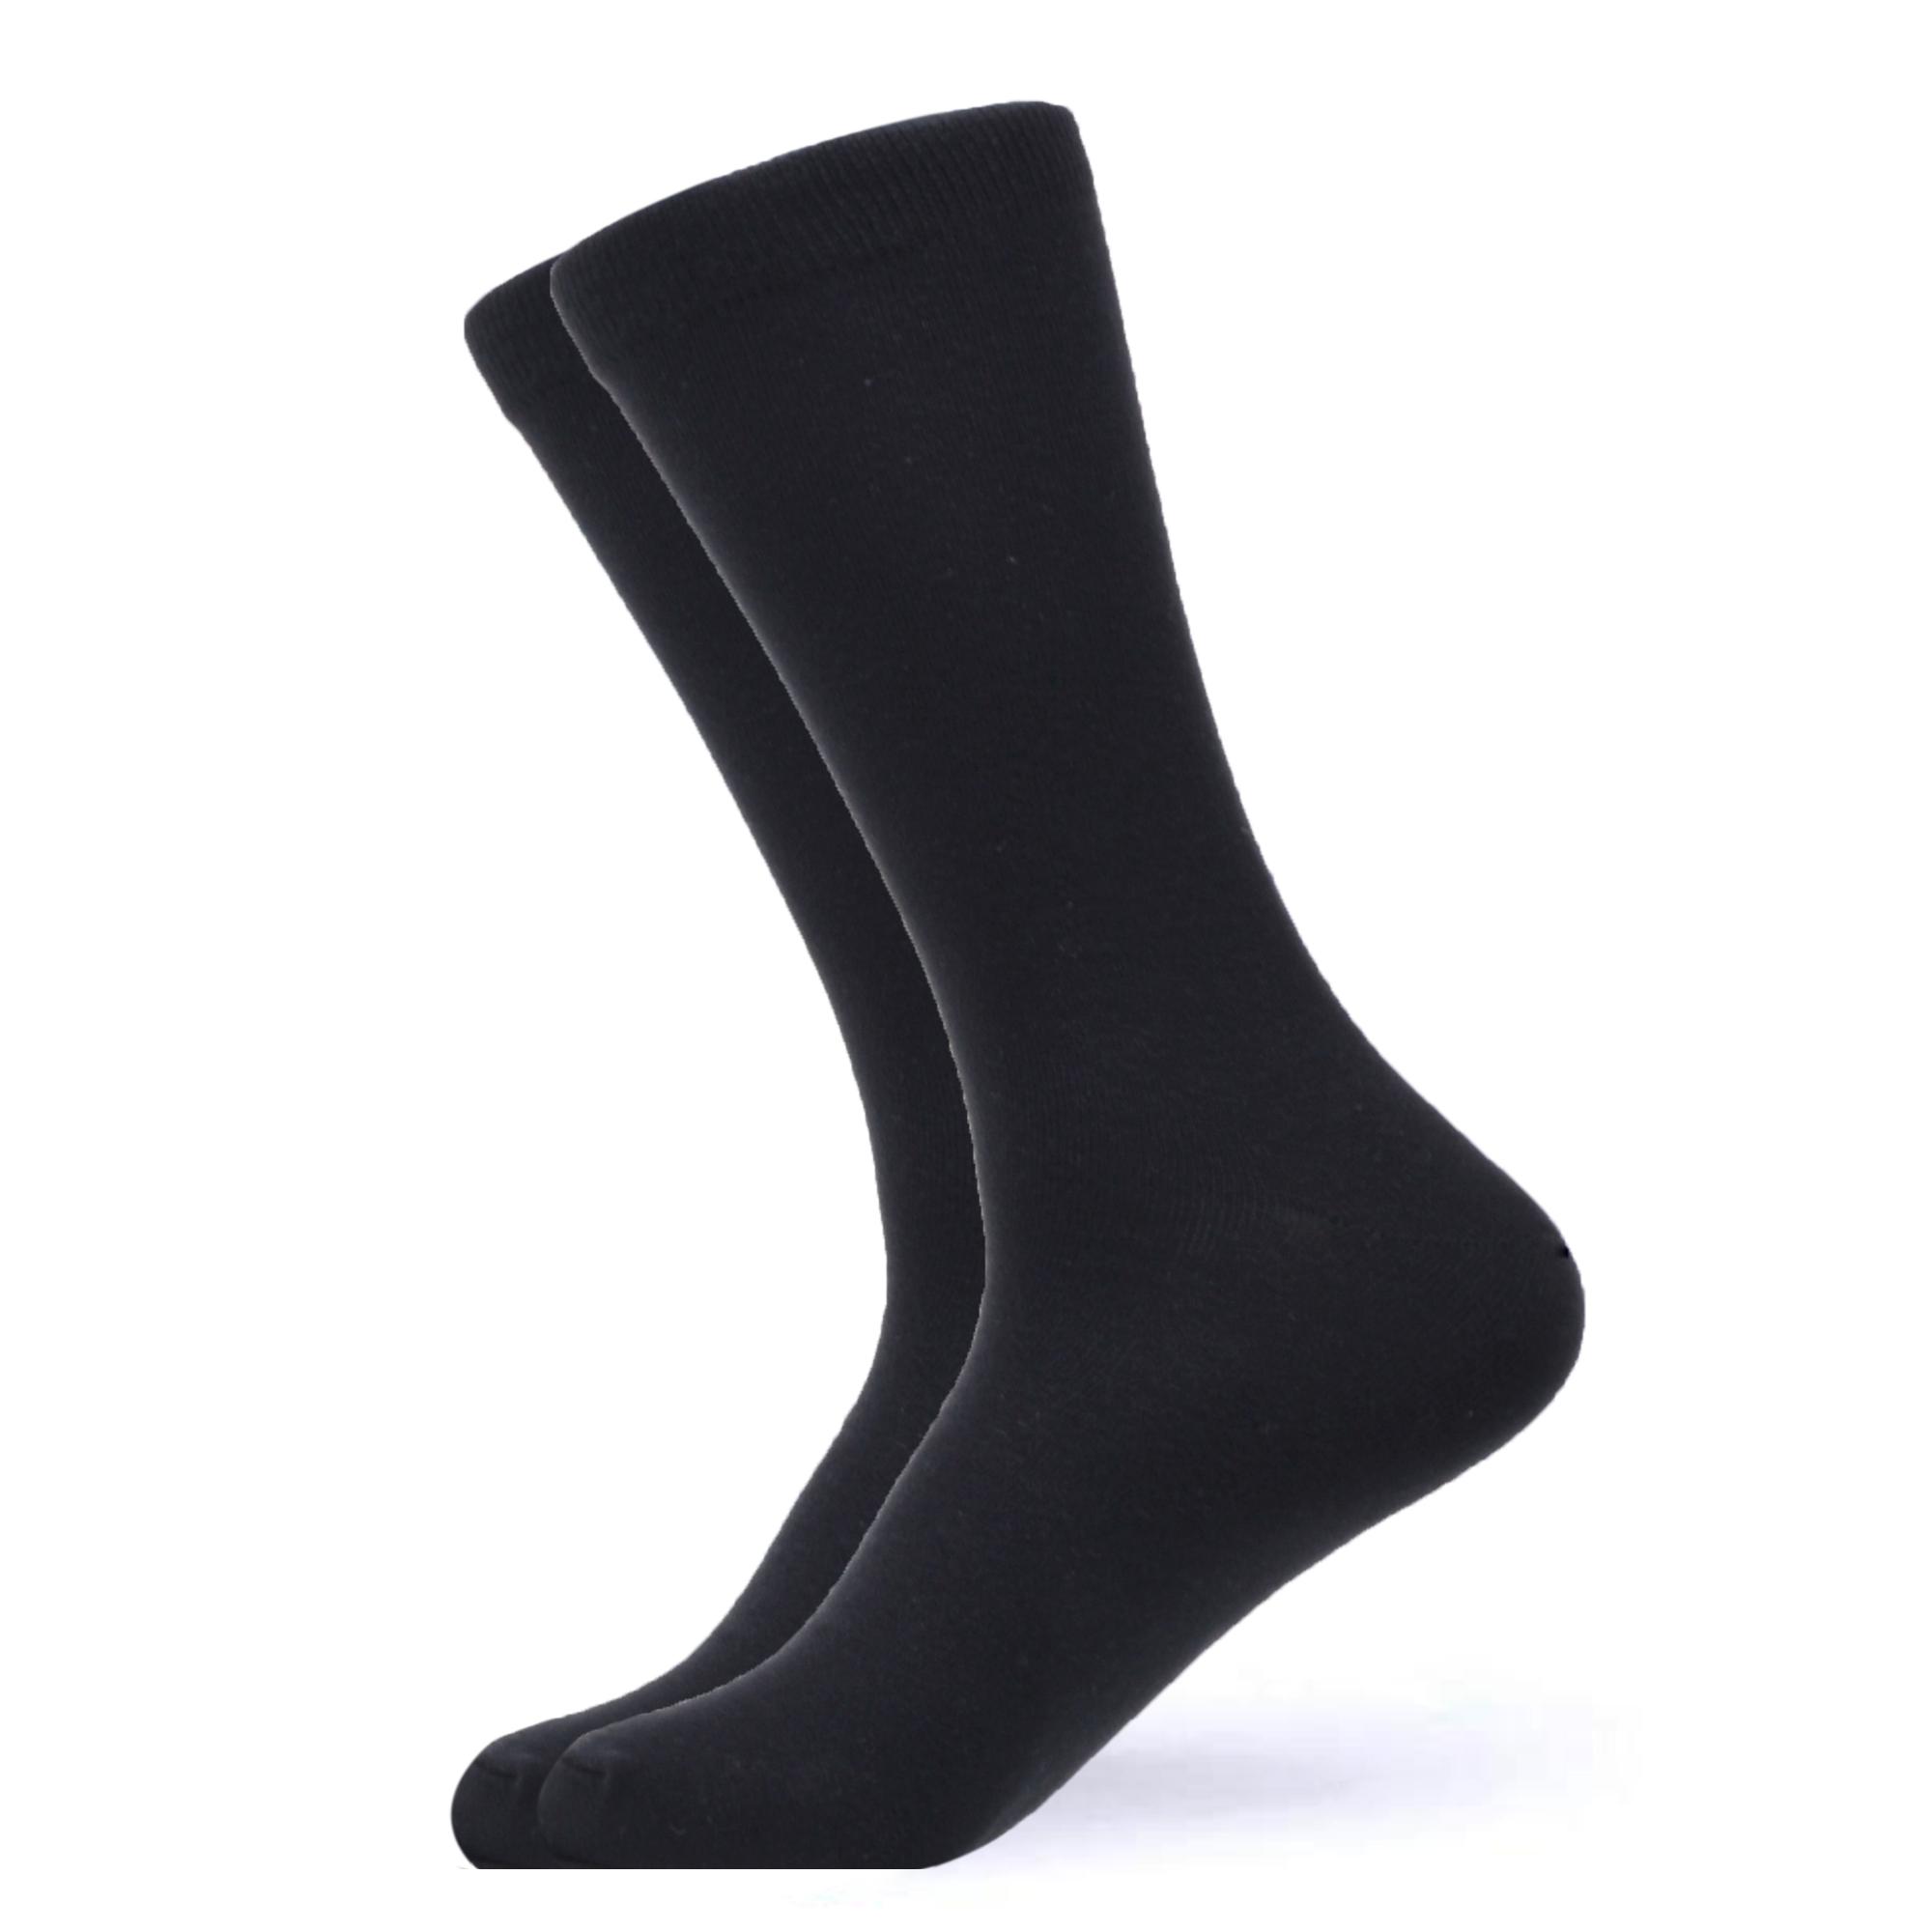 Black Dress Socks 2 For 12 Black Dress Socks Dress Socks Long Black Socks [ 2000 x 2000 Pixel ]